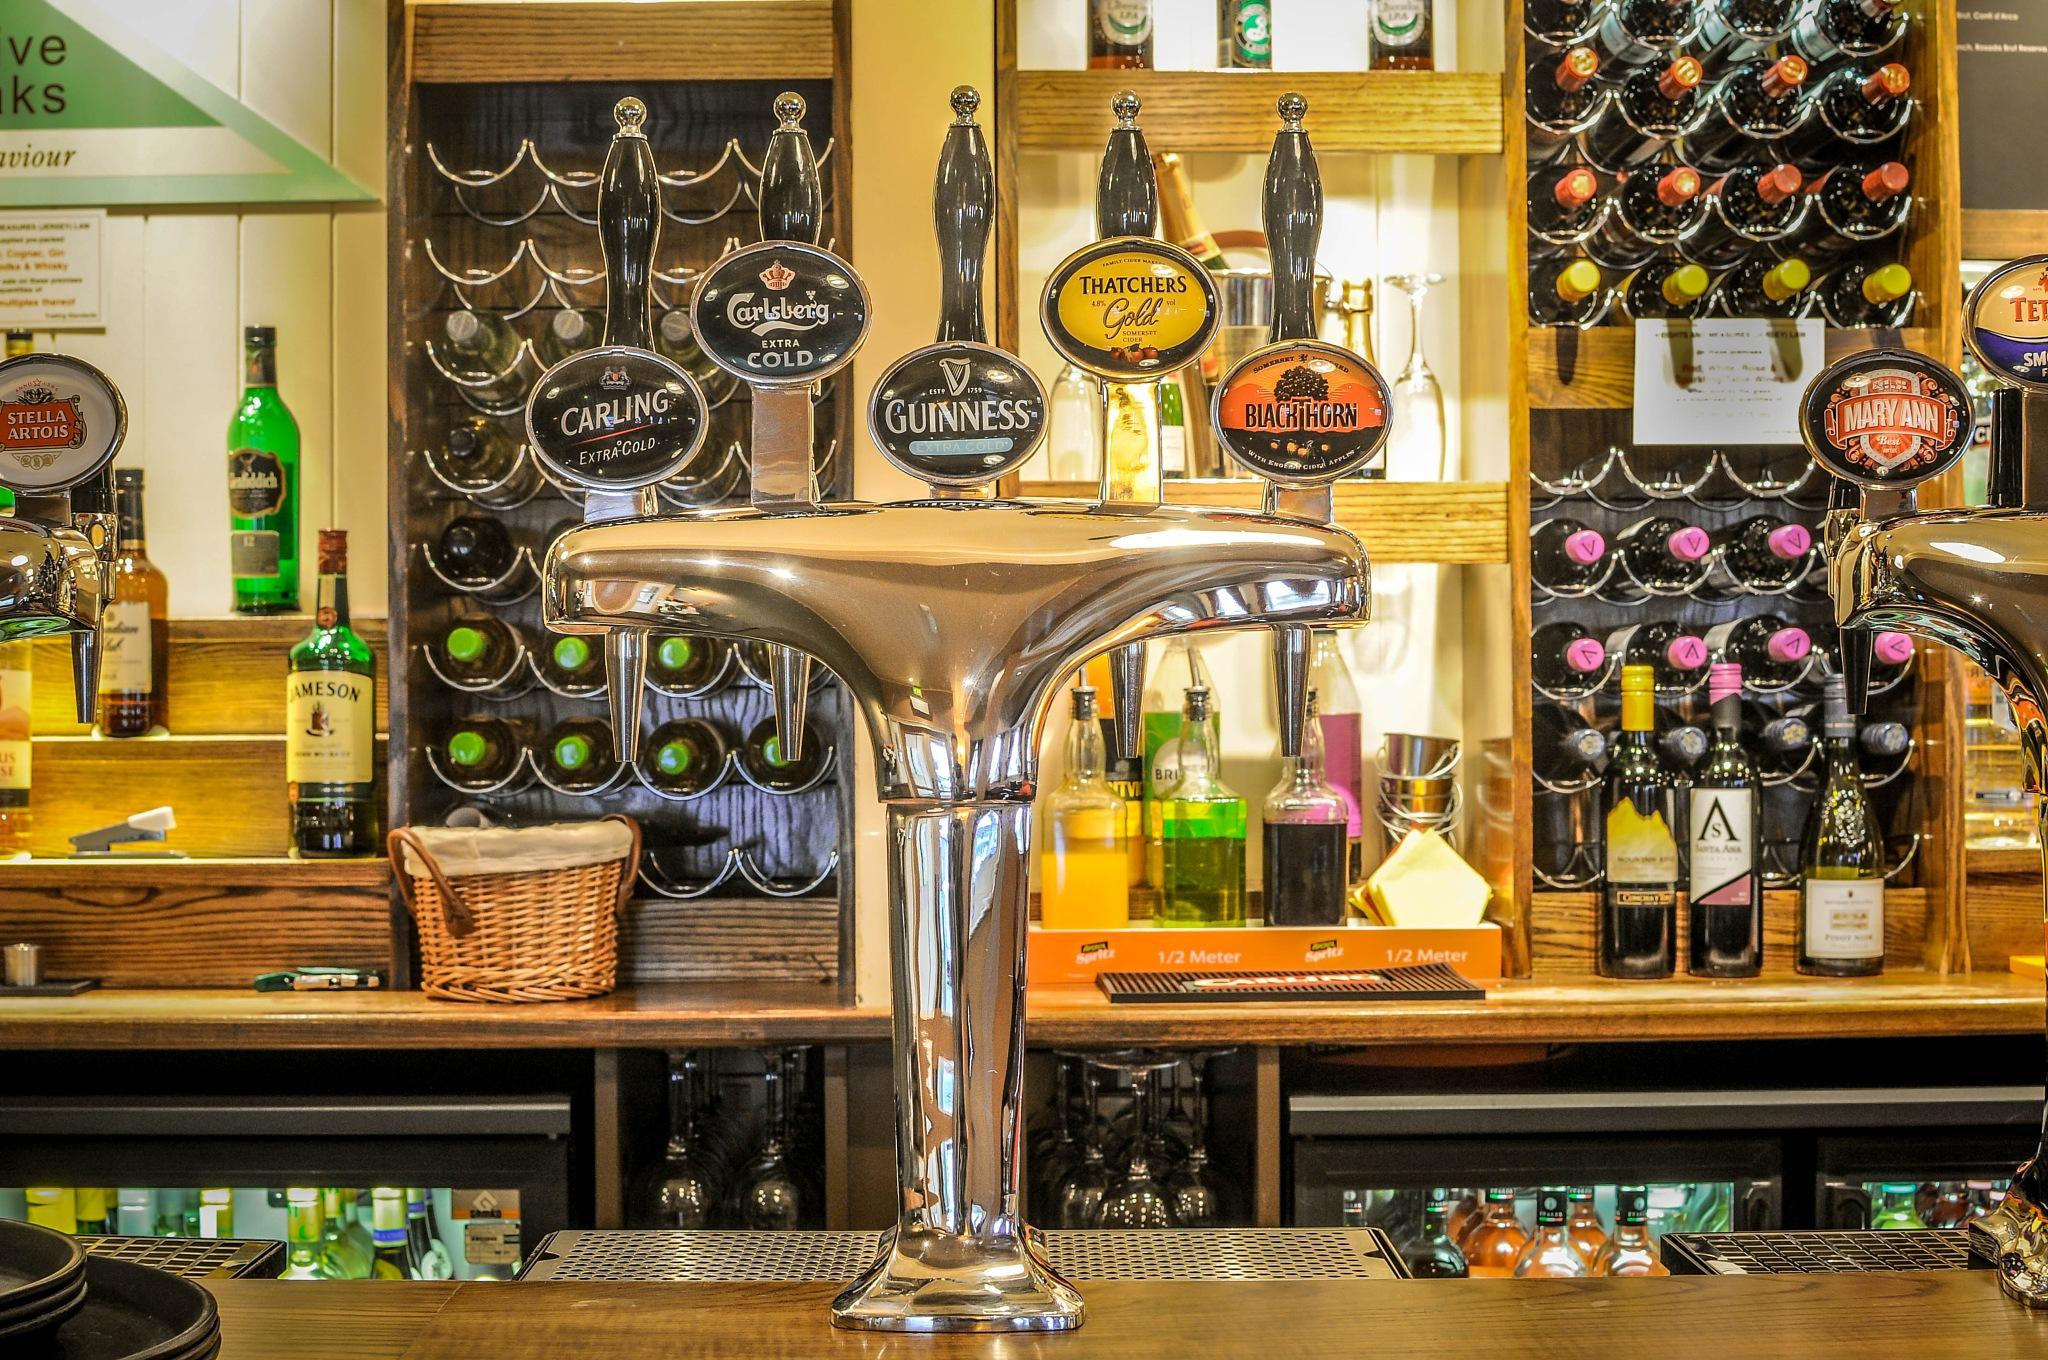 the bar by Chuculain